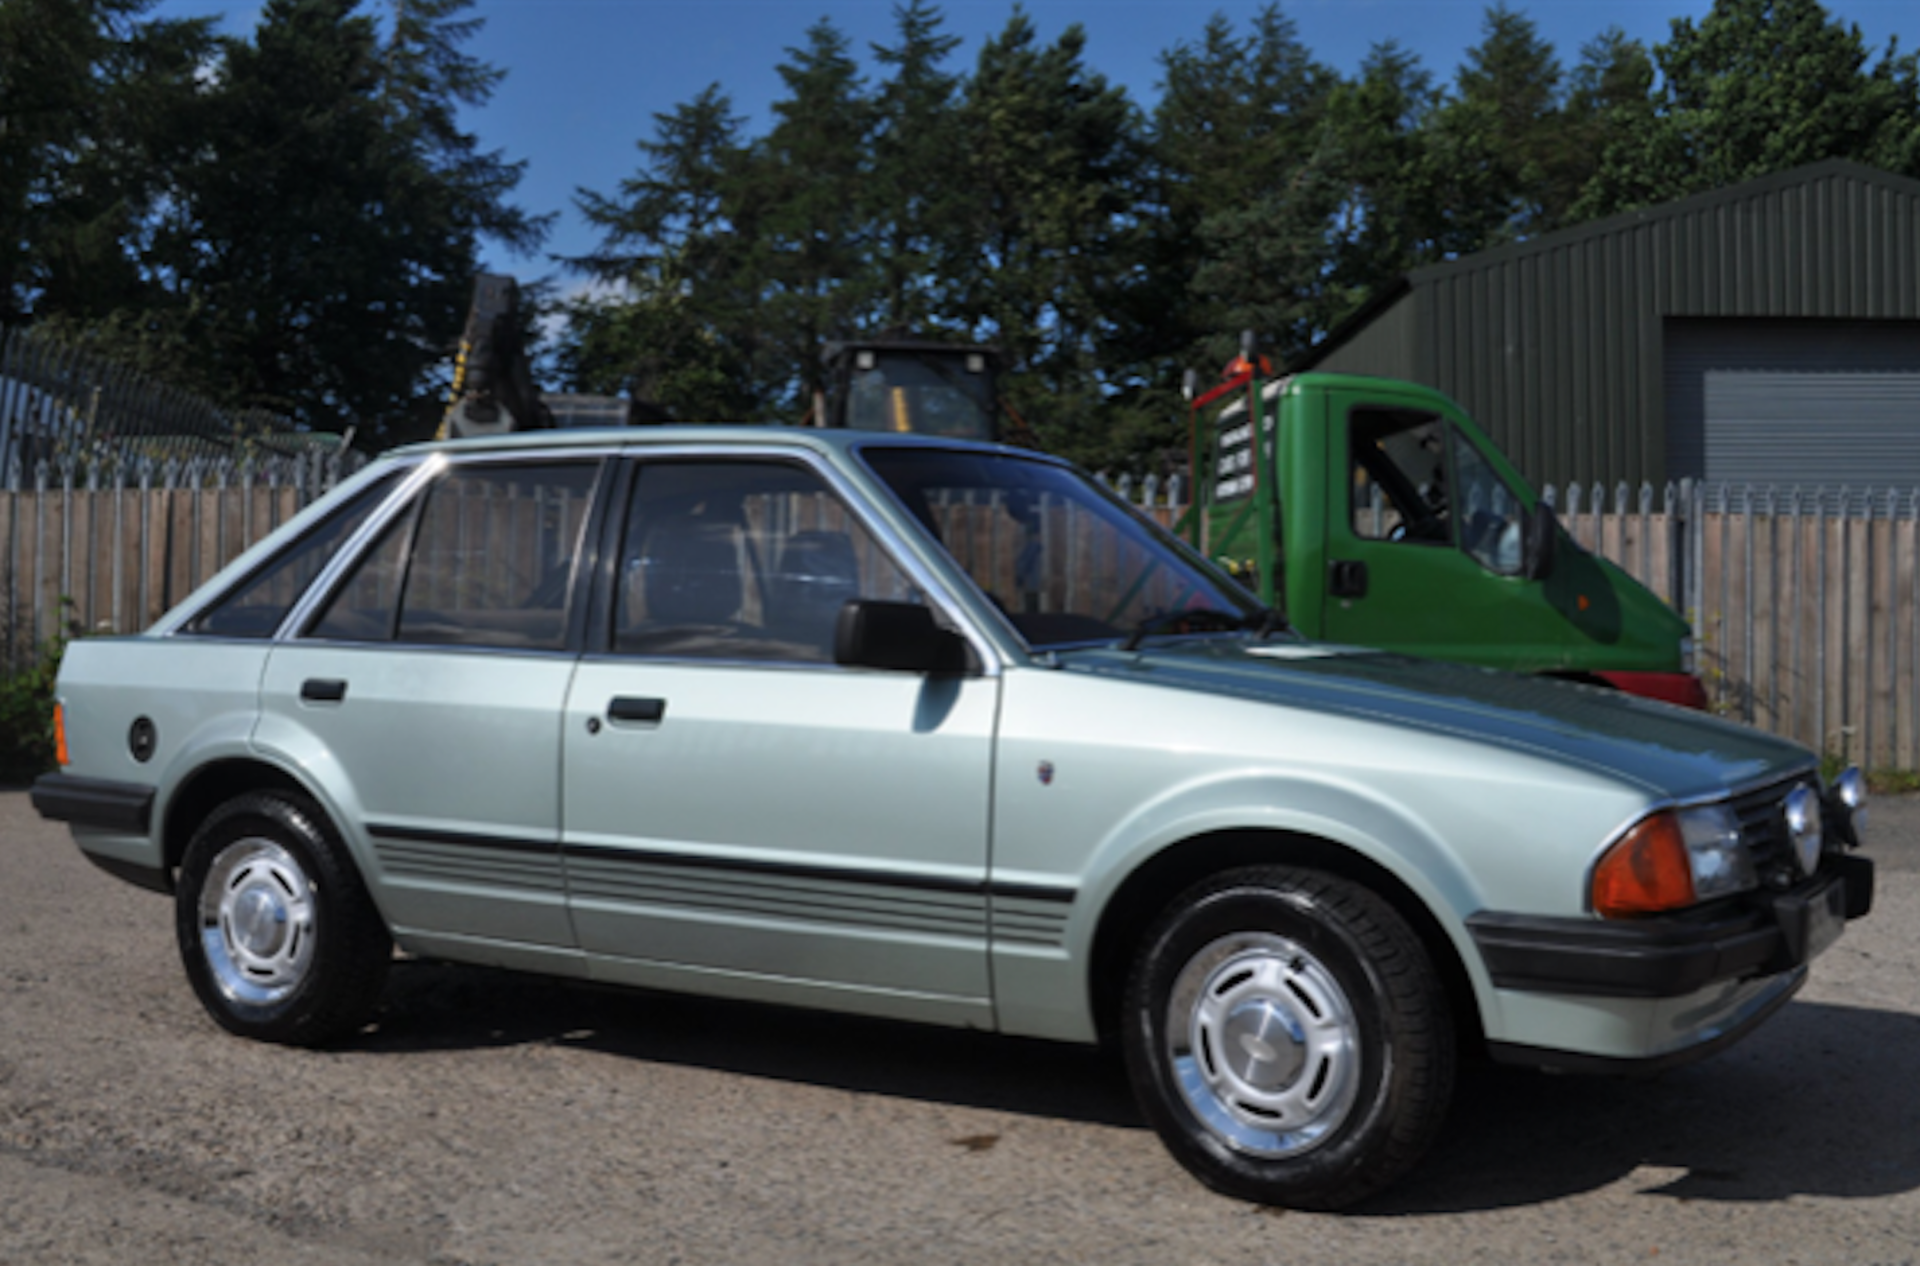 Lot 12 - 1983 Ford Escort 1.6 Ghia